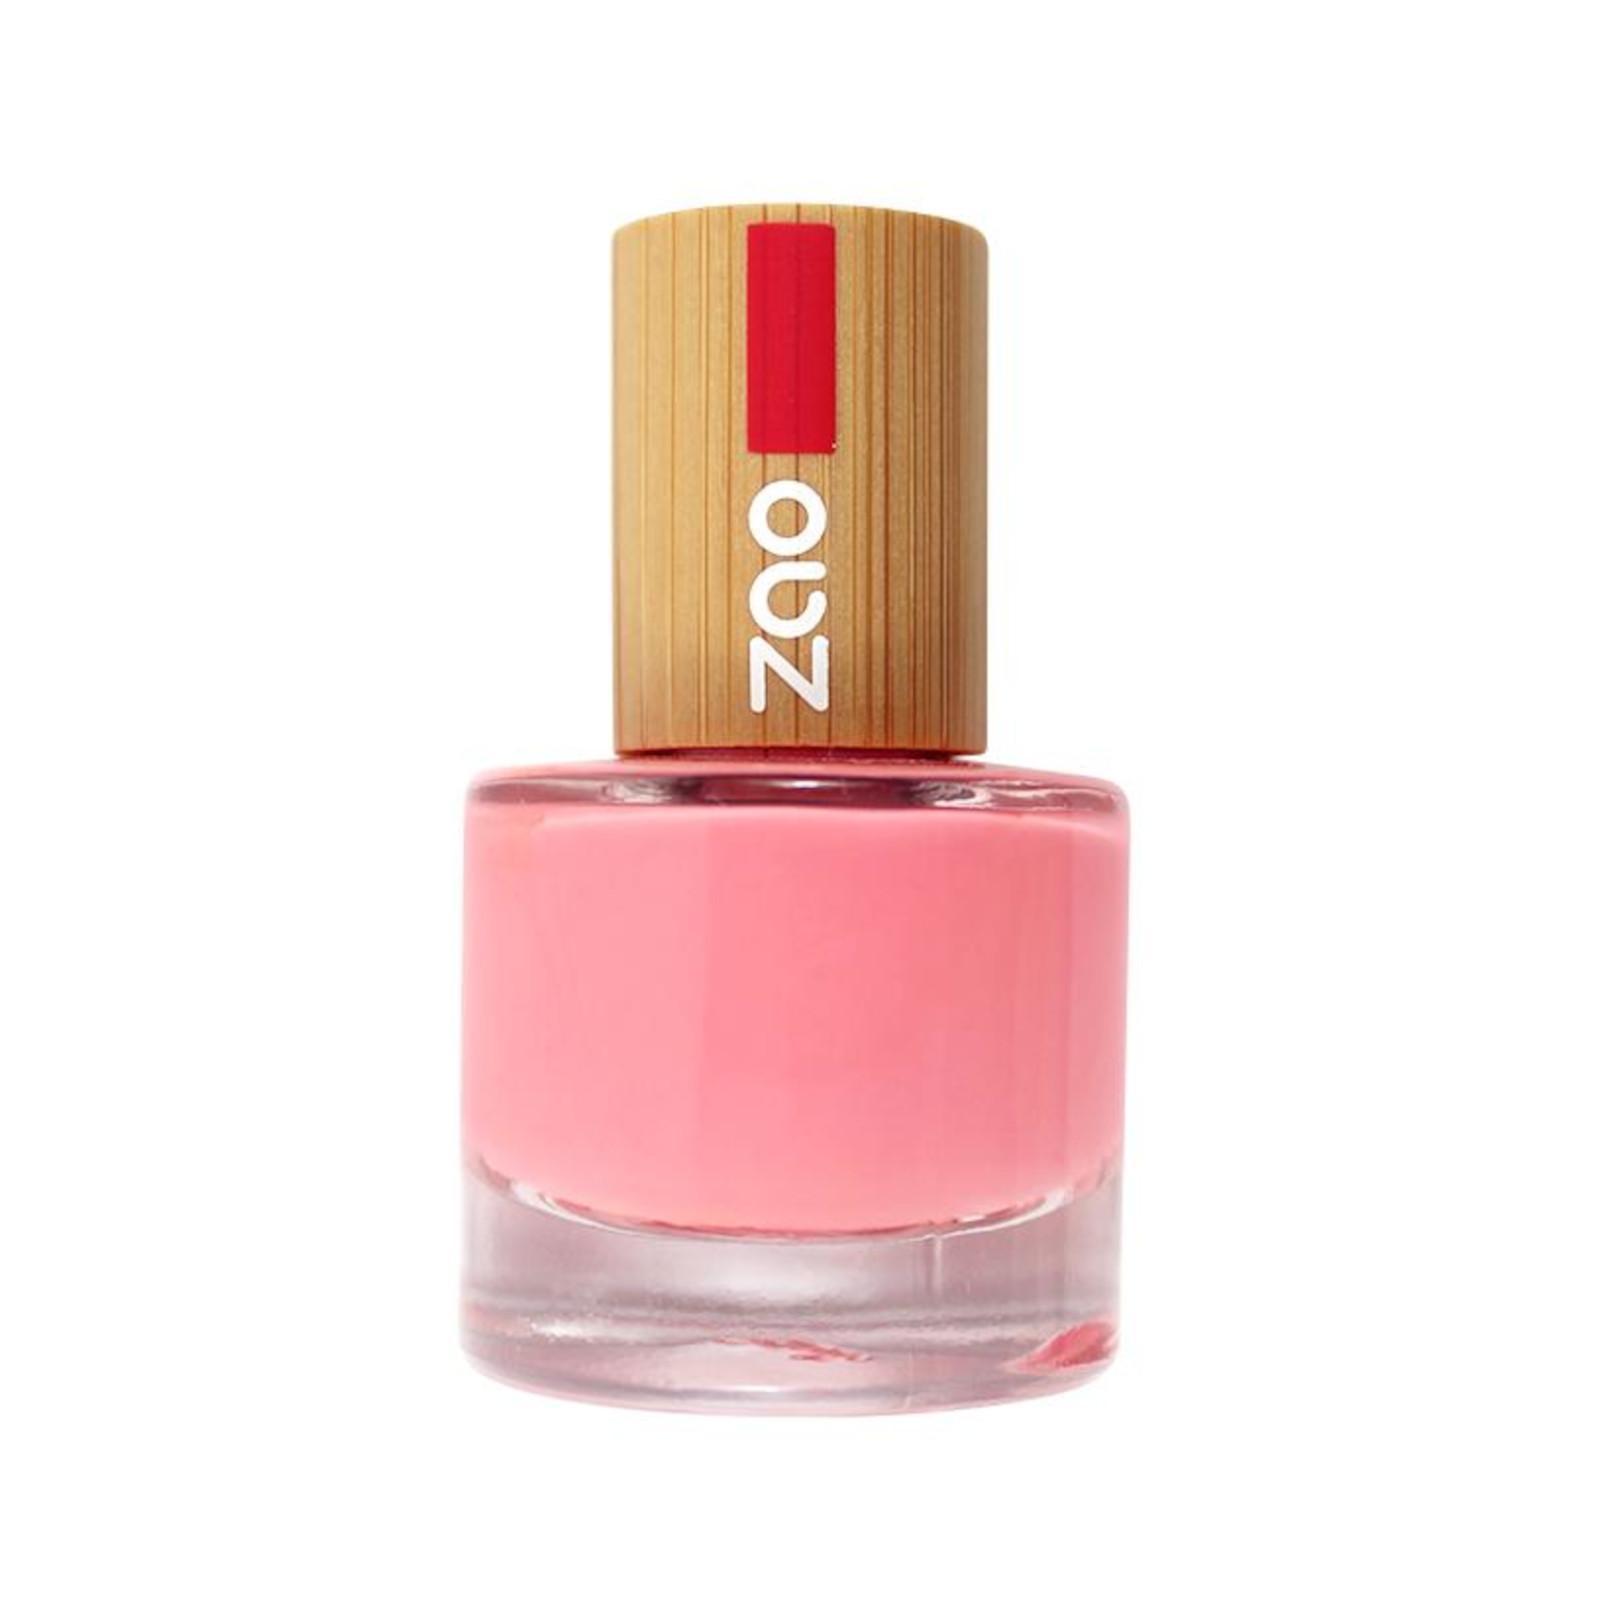 Biooo Cz Zao Lak Na Nehty 654 Hot Pink 8 Ml